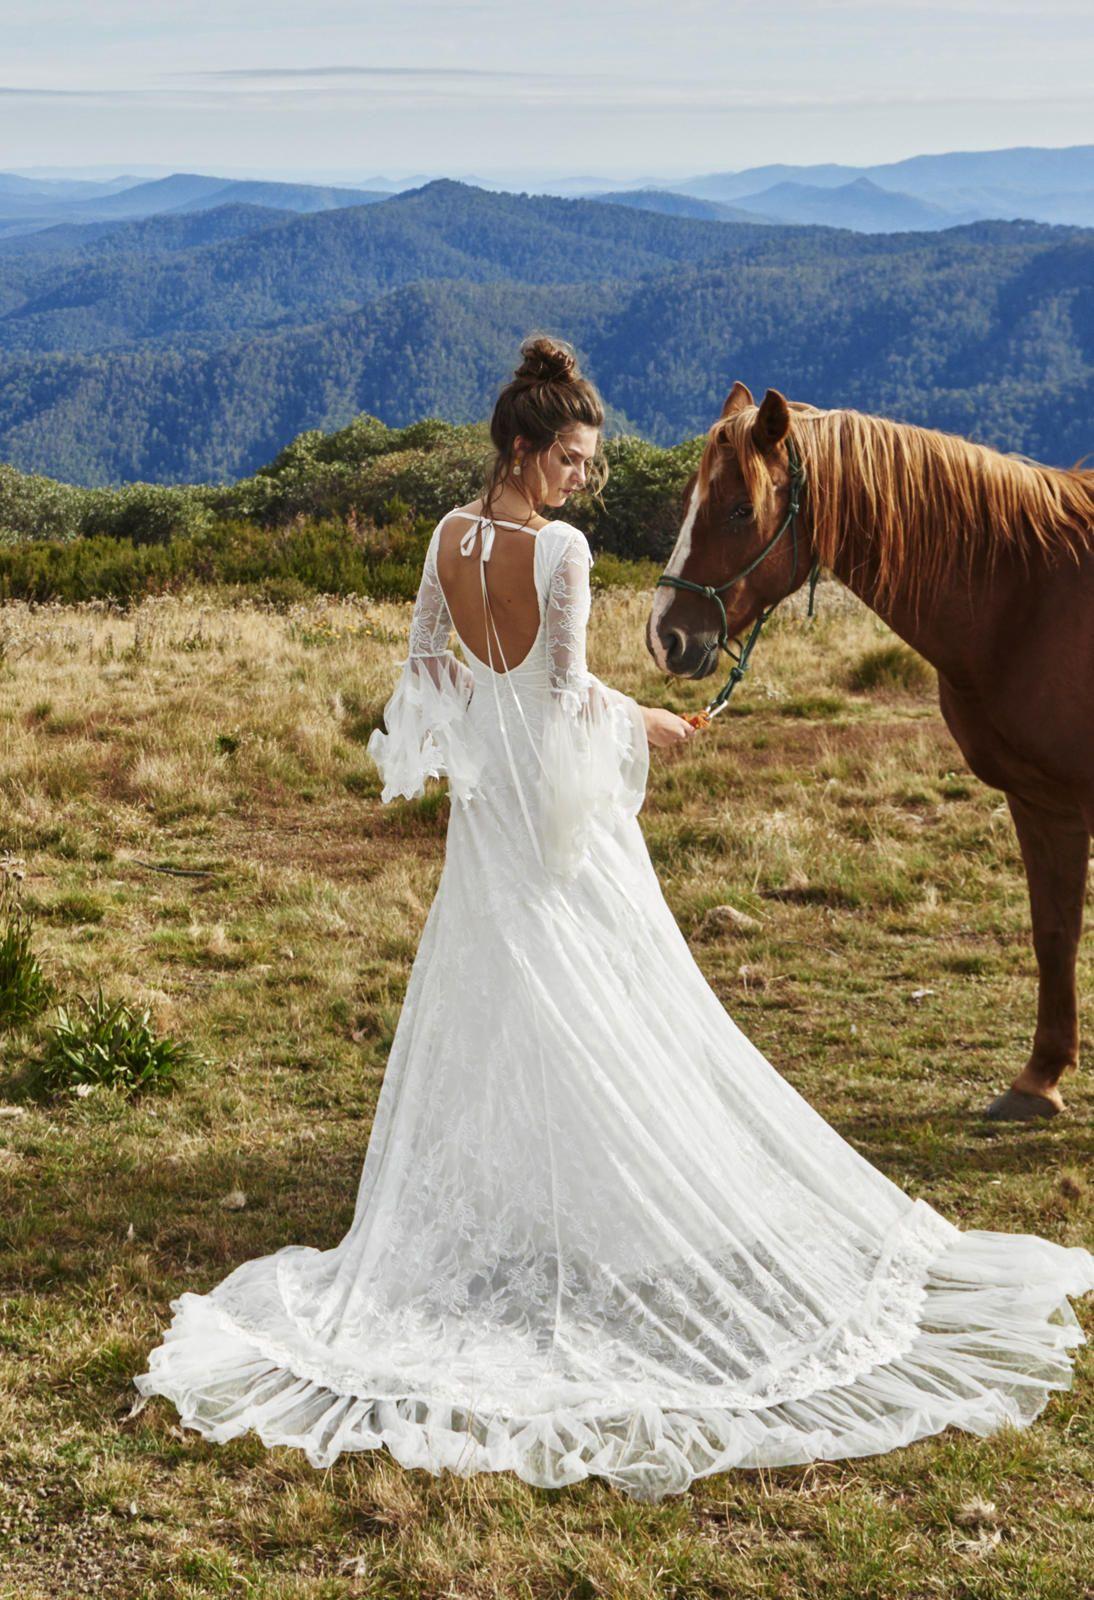 Redneck wedding dress  Romantic Country Wedding Dresses  My Wedding  Pinterest  Country